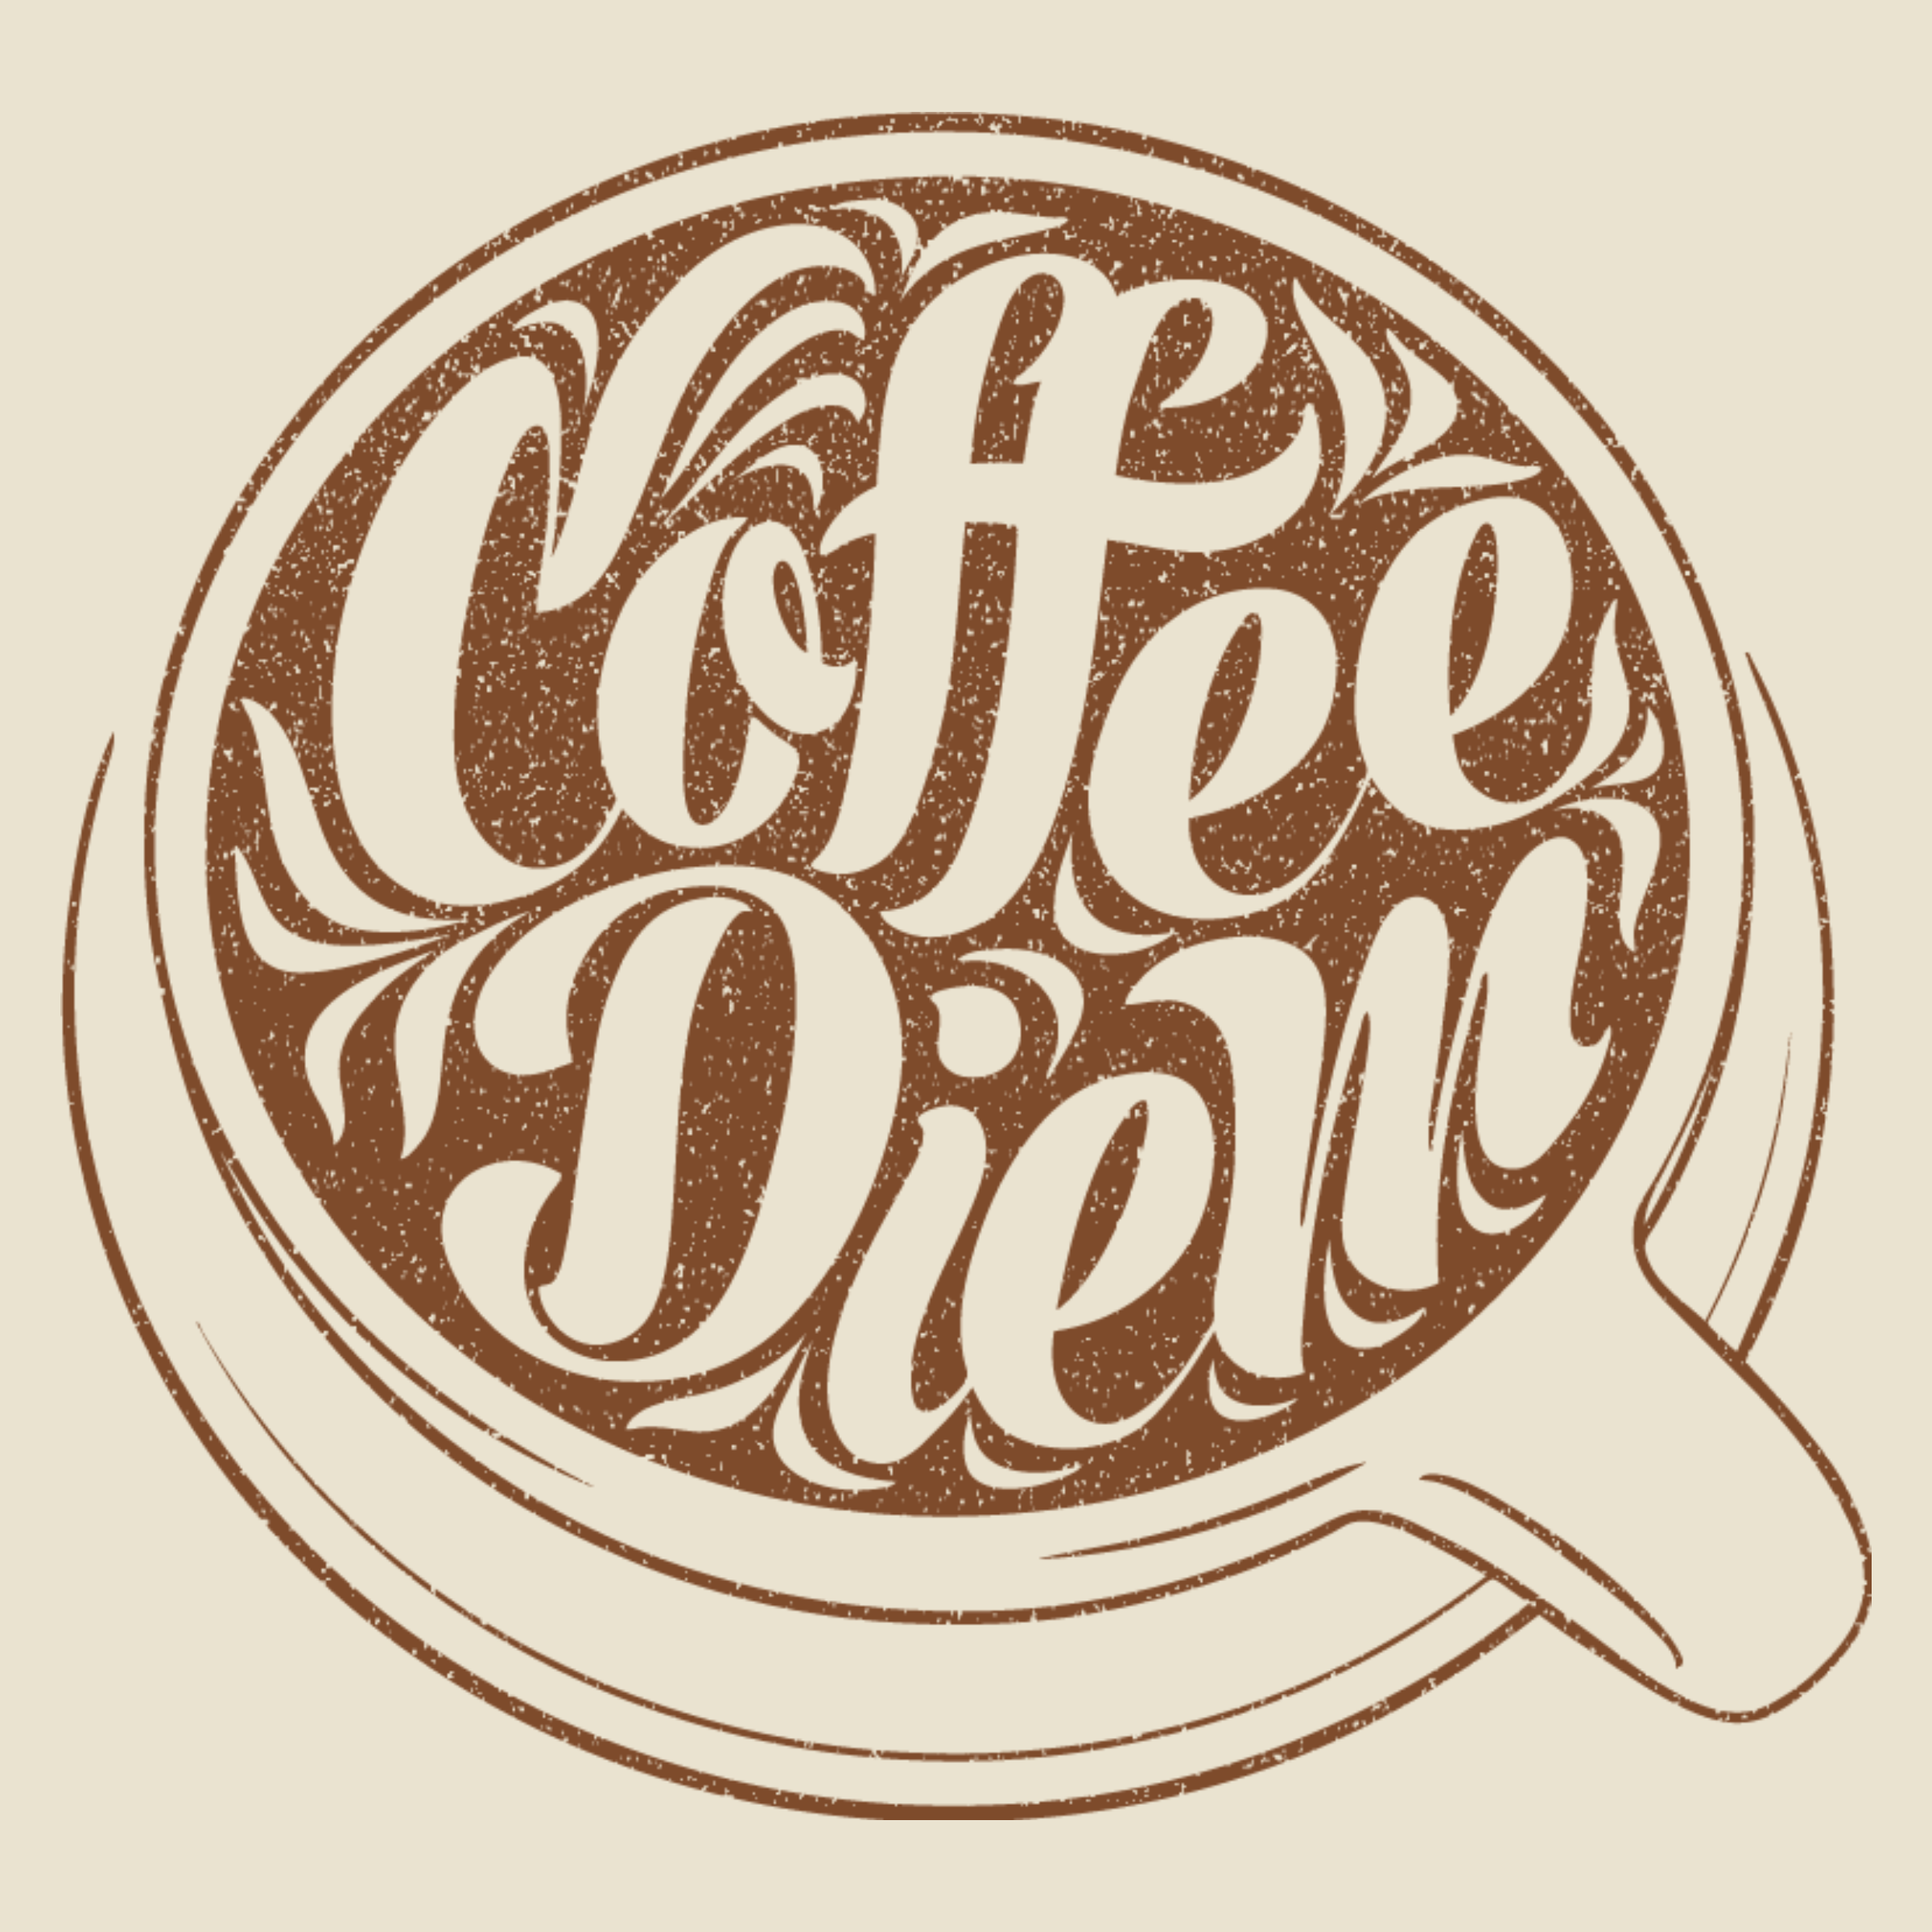 Coffee Diem